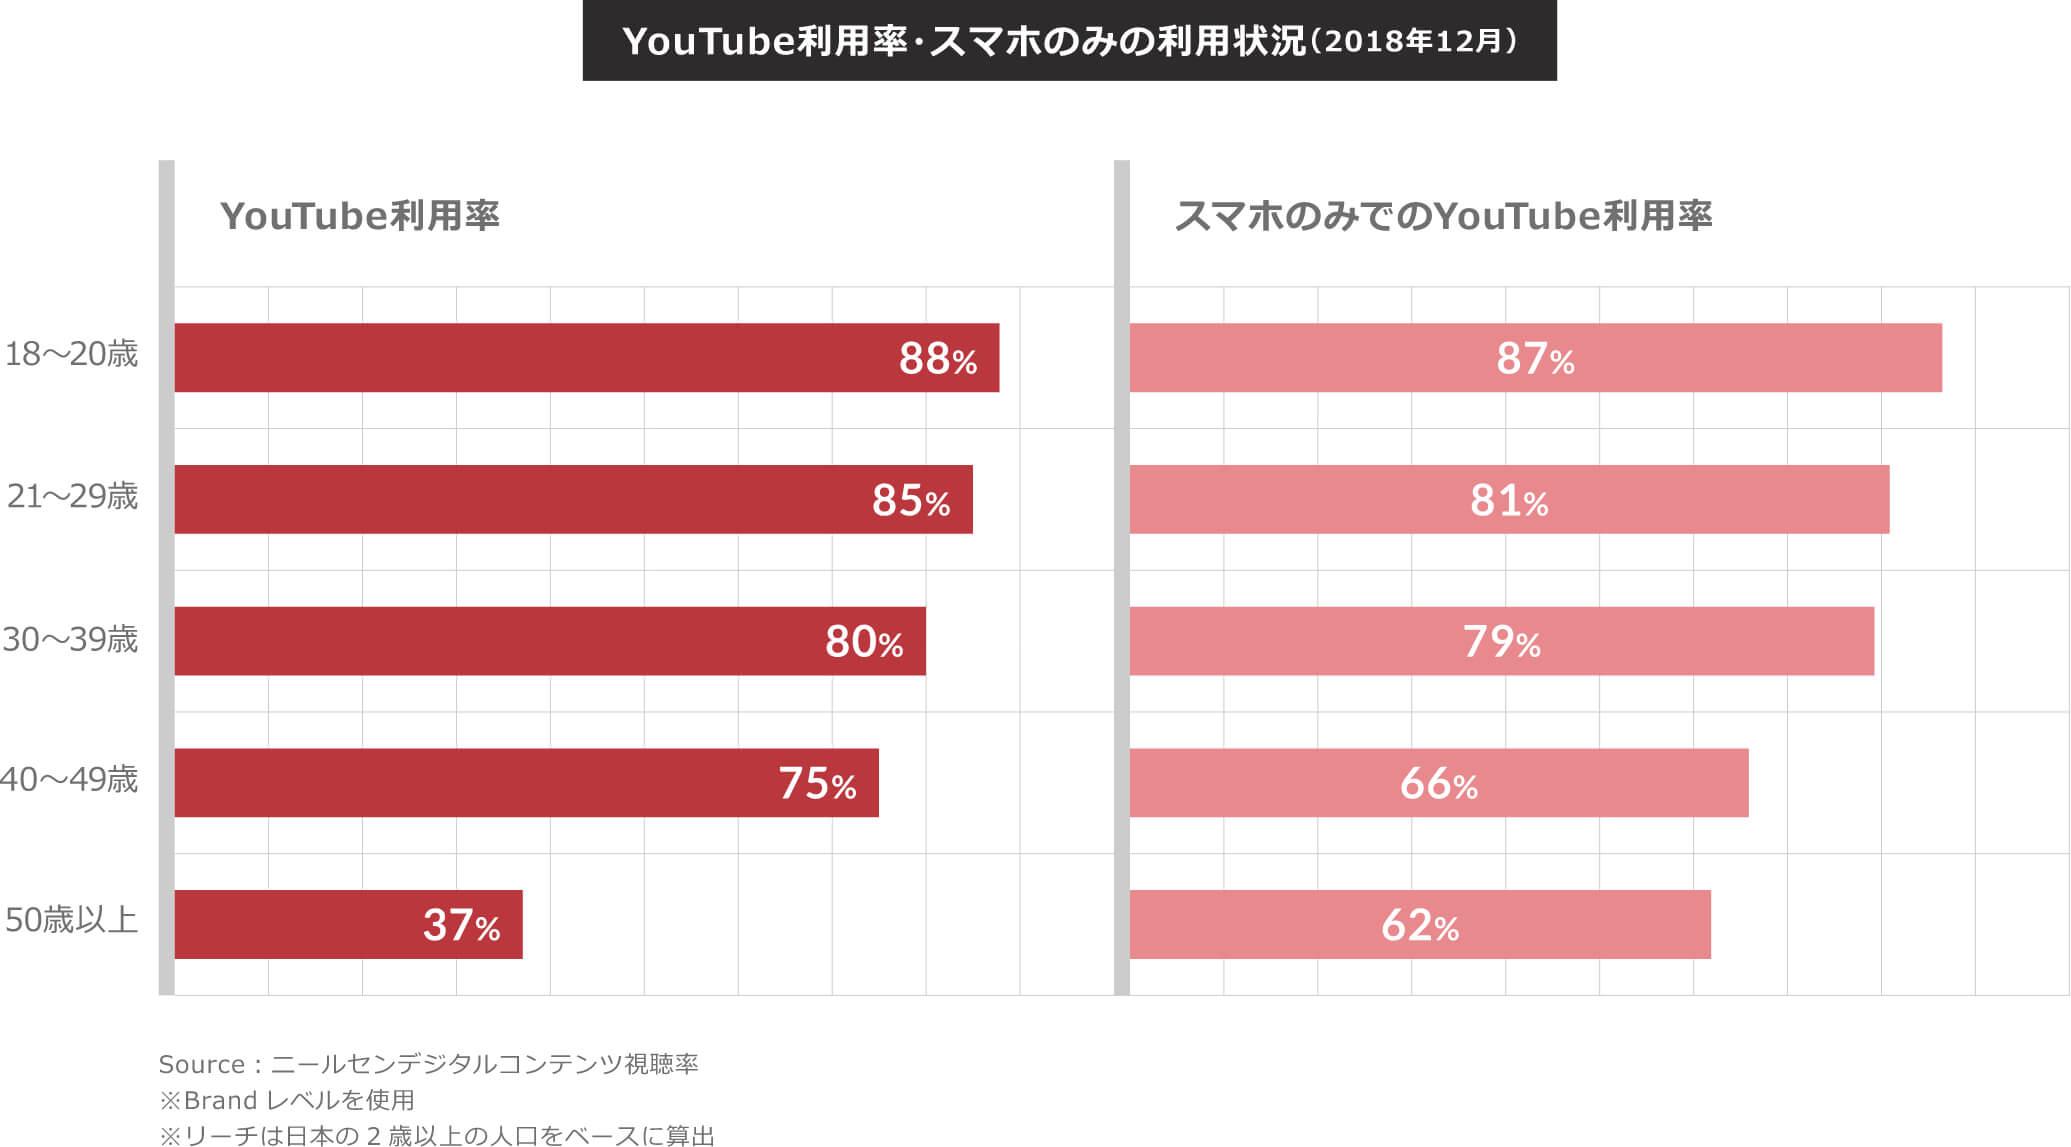 youtube利用率・スマホのみの利用状況(2018年12月)